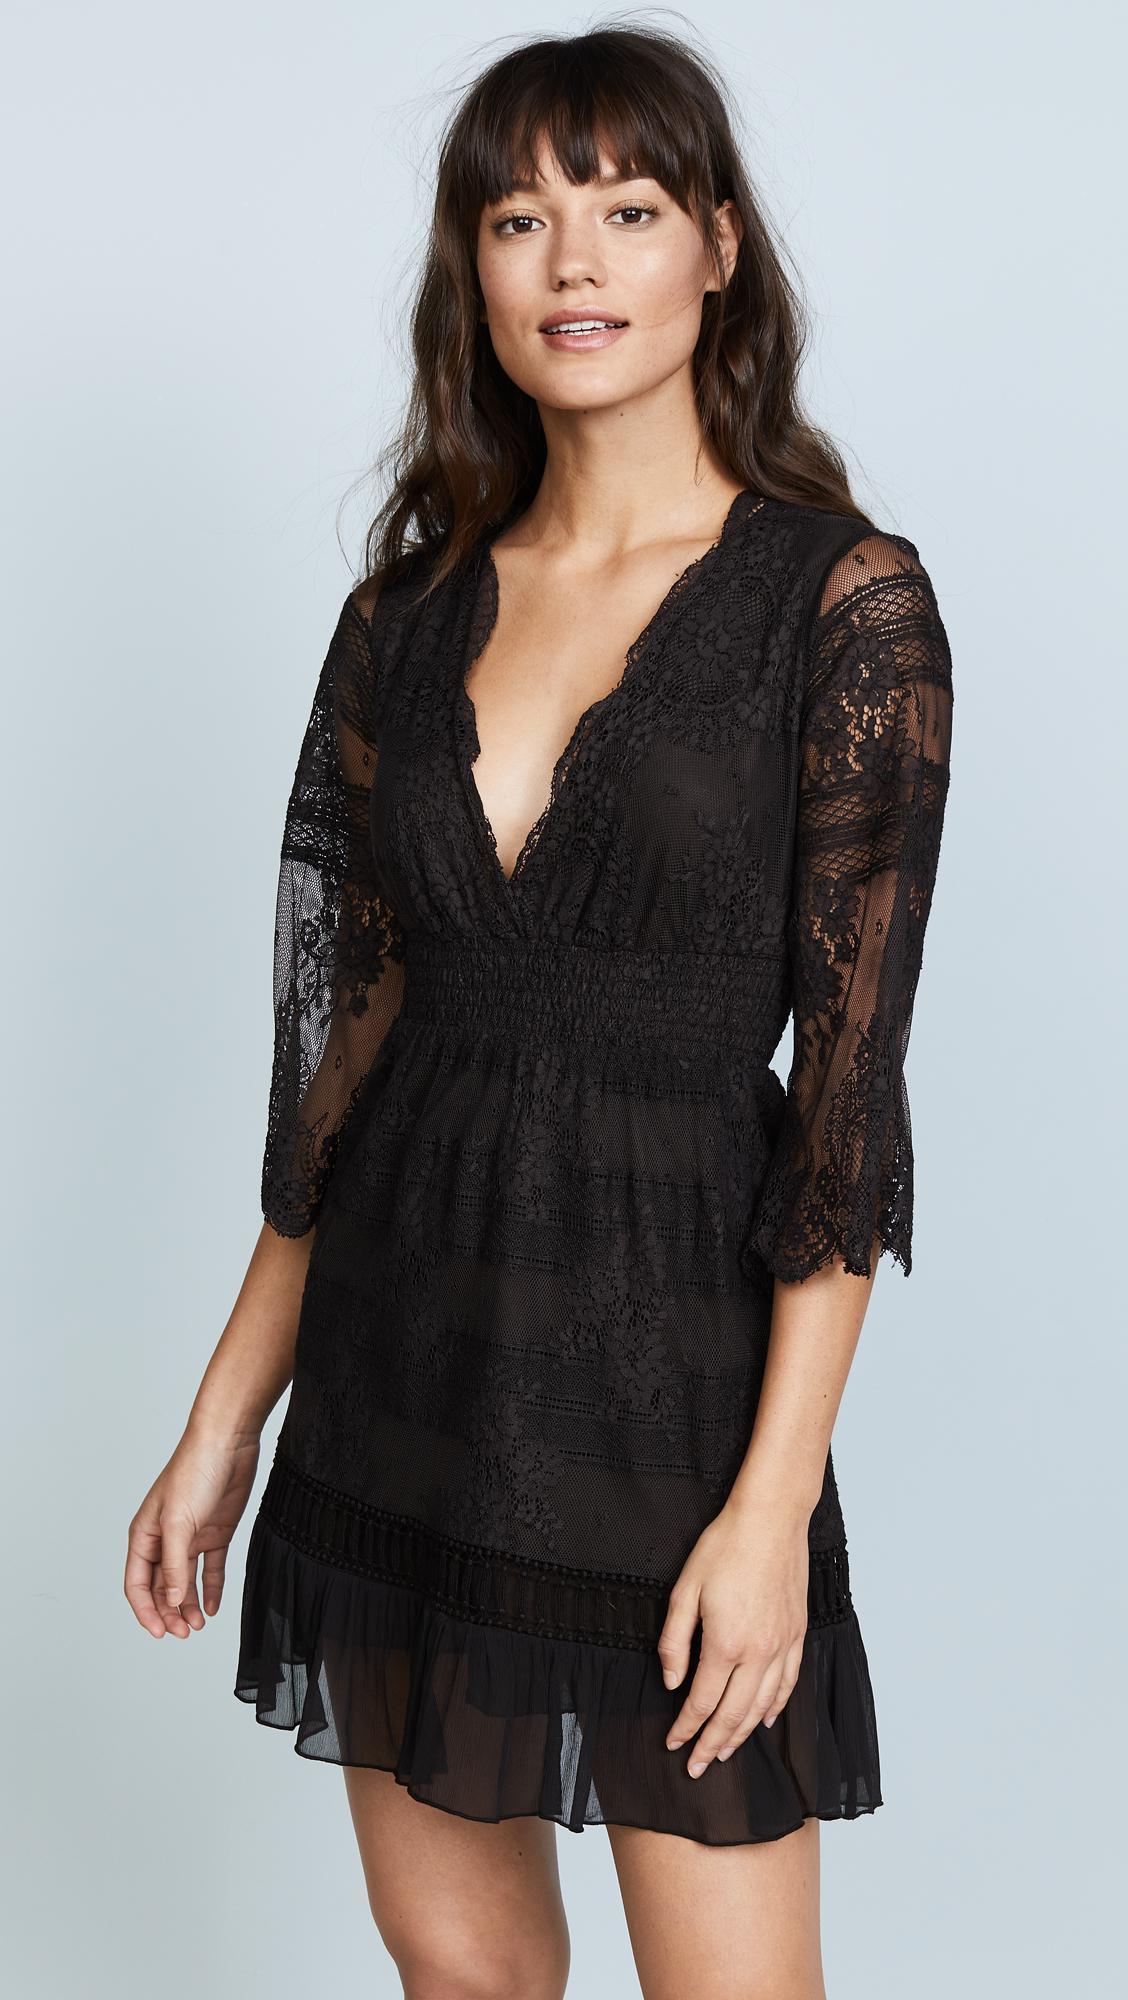 black dress temptation